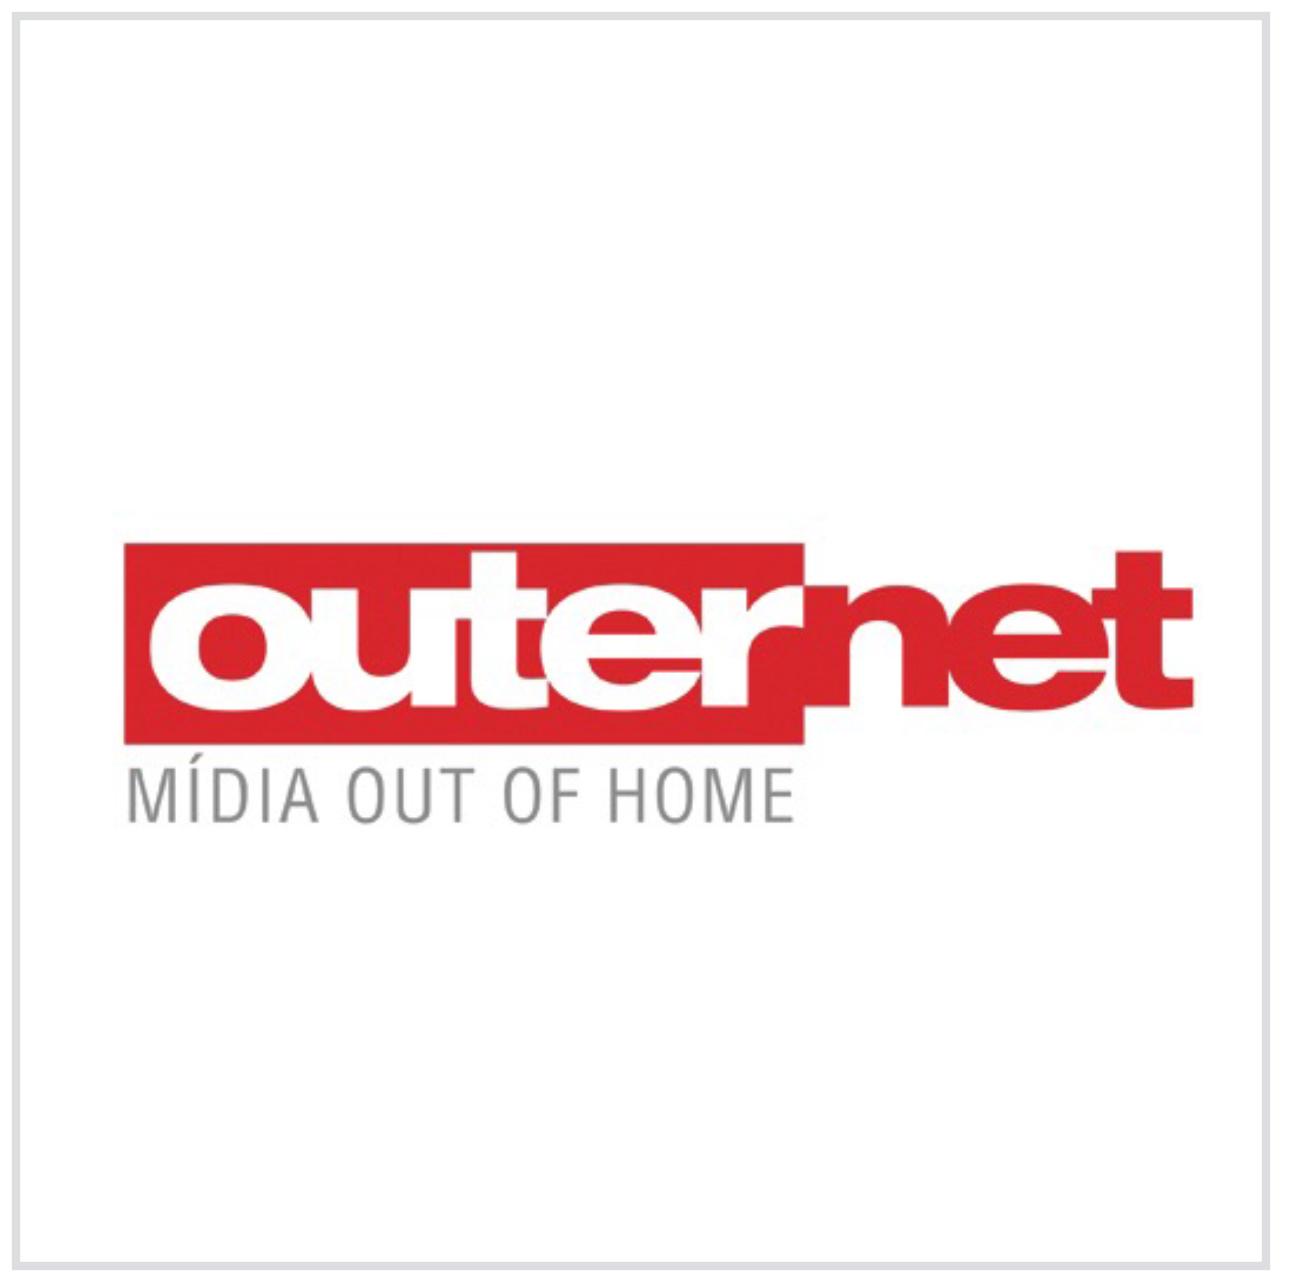 logo_outernet